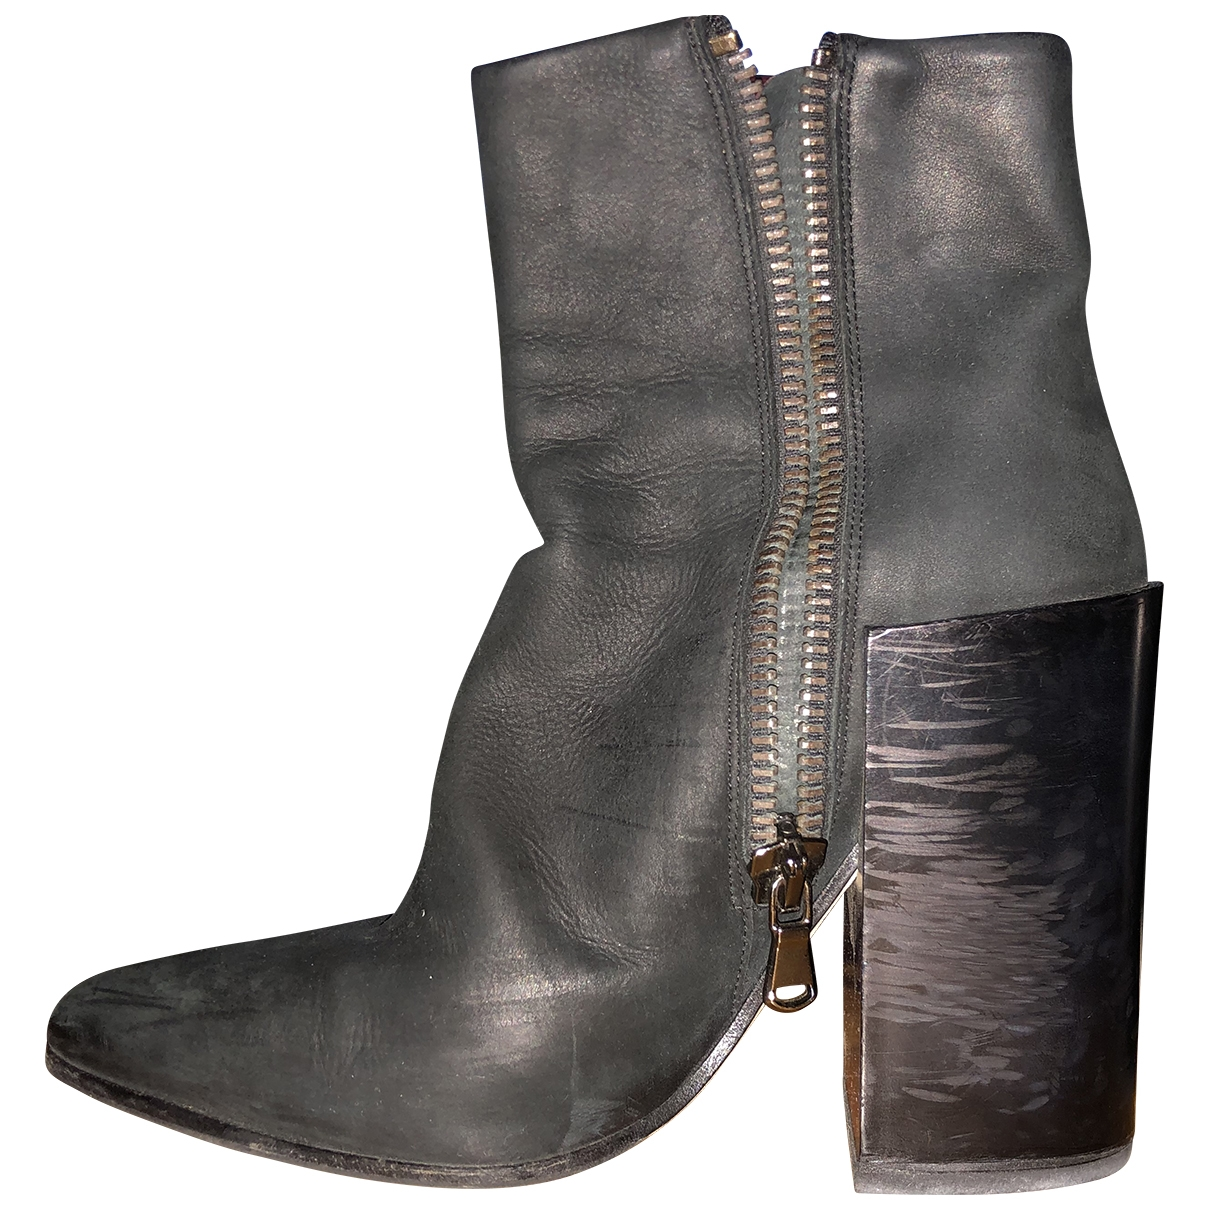 Acne Studios Pistol Black Leather Ankle boots for Women 37 EU